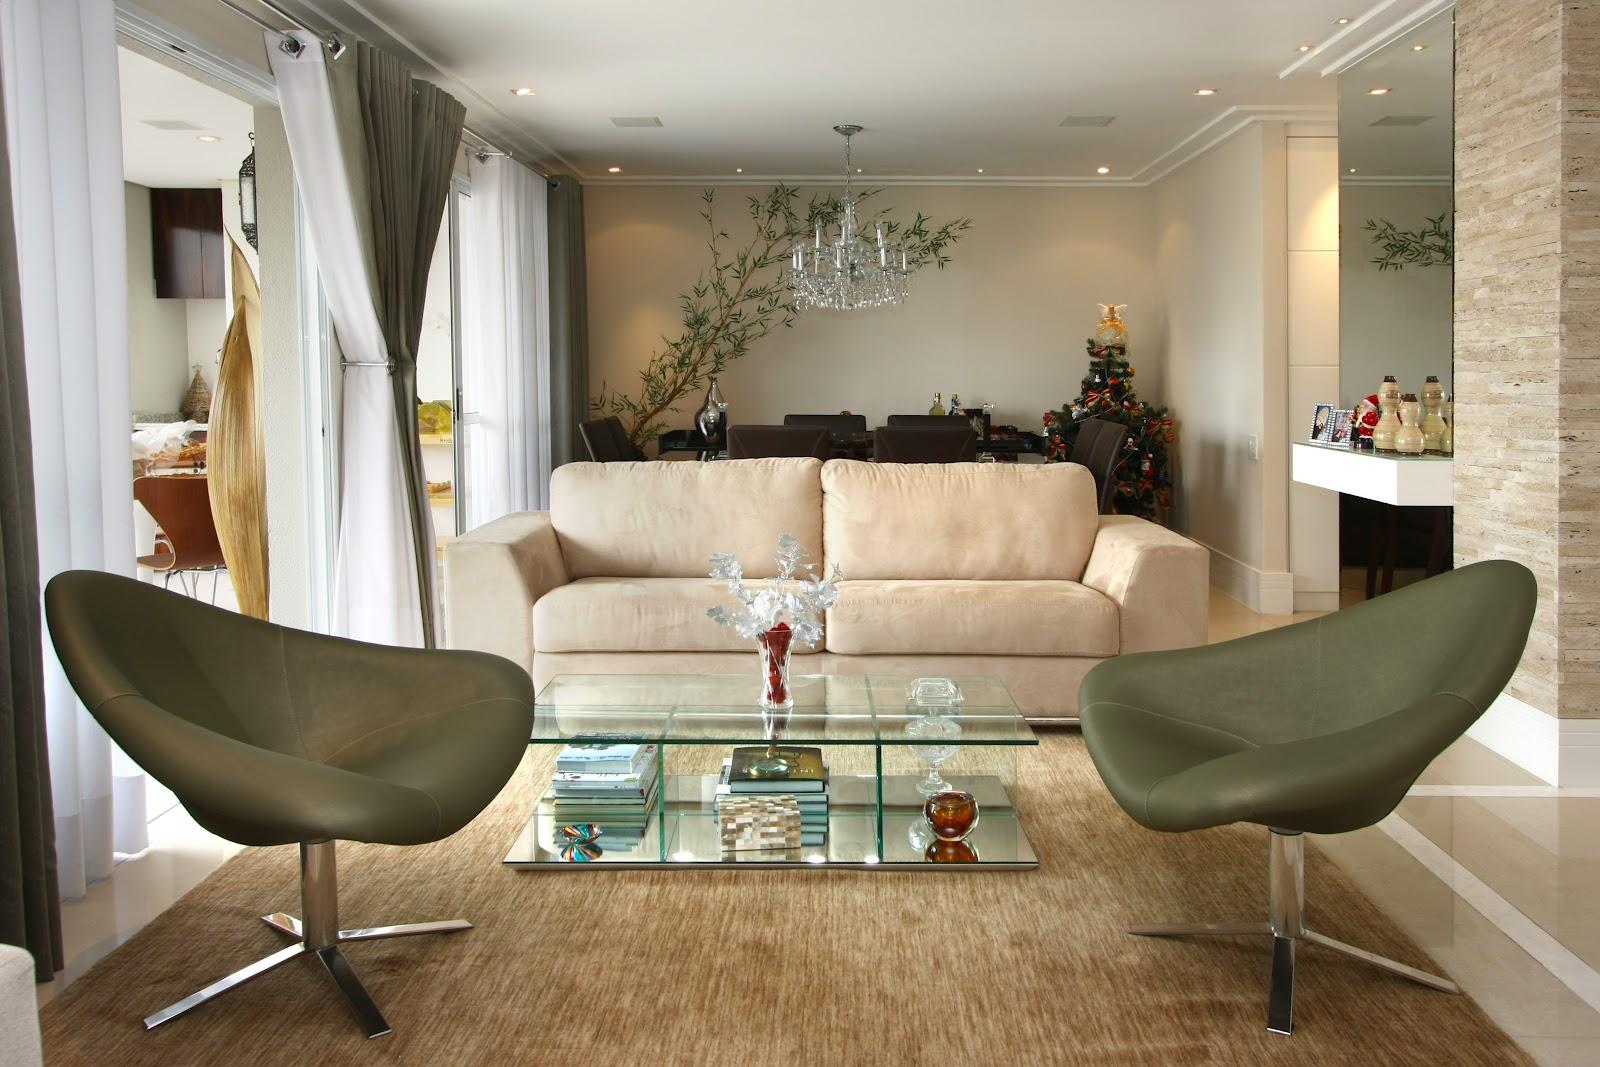 Fotos de sala de estar decorada for Fotos de sala de estar